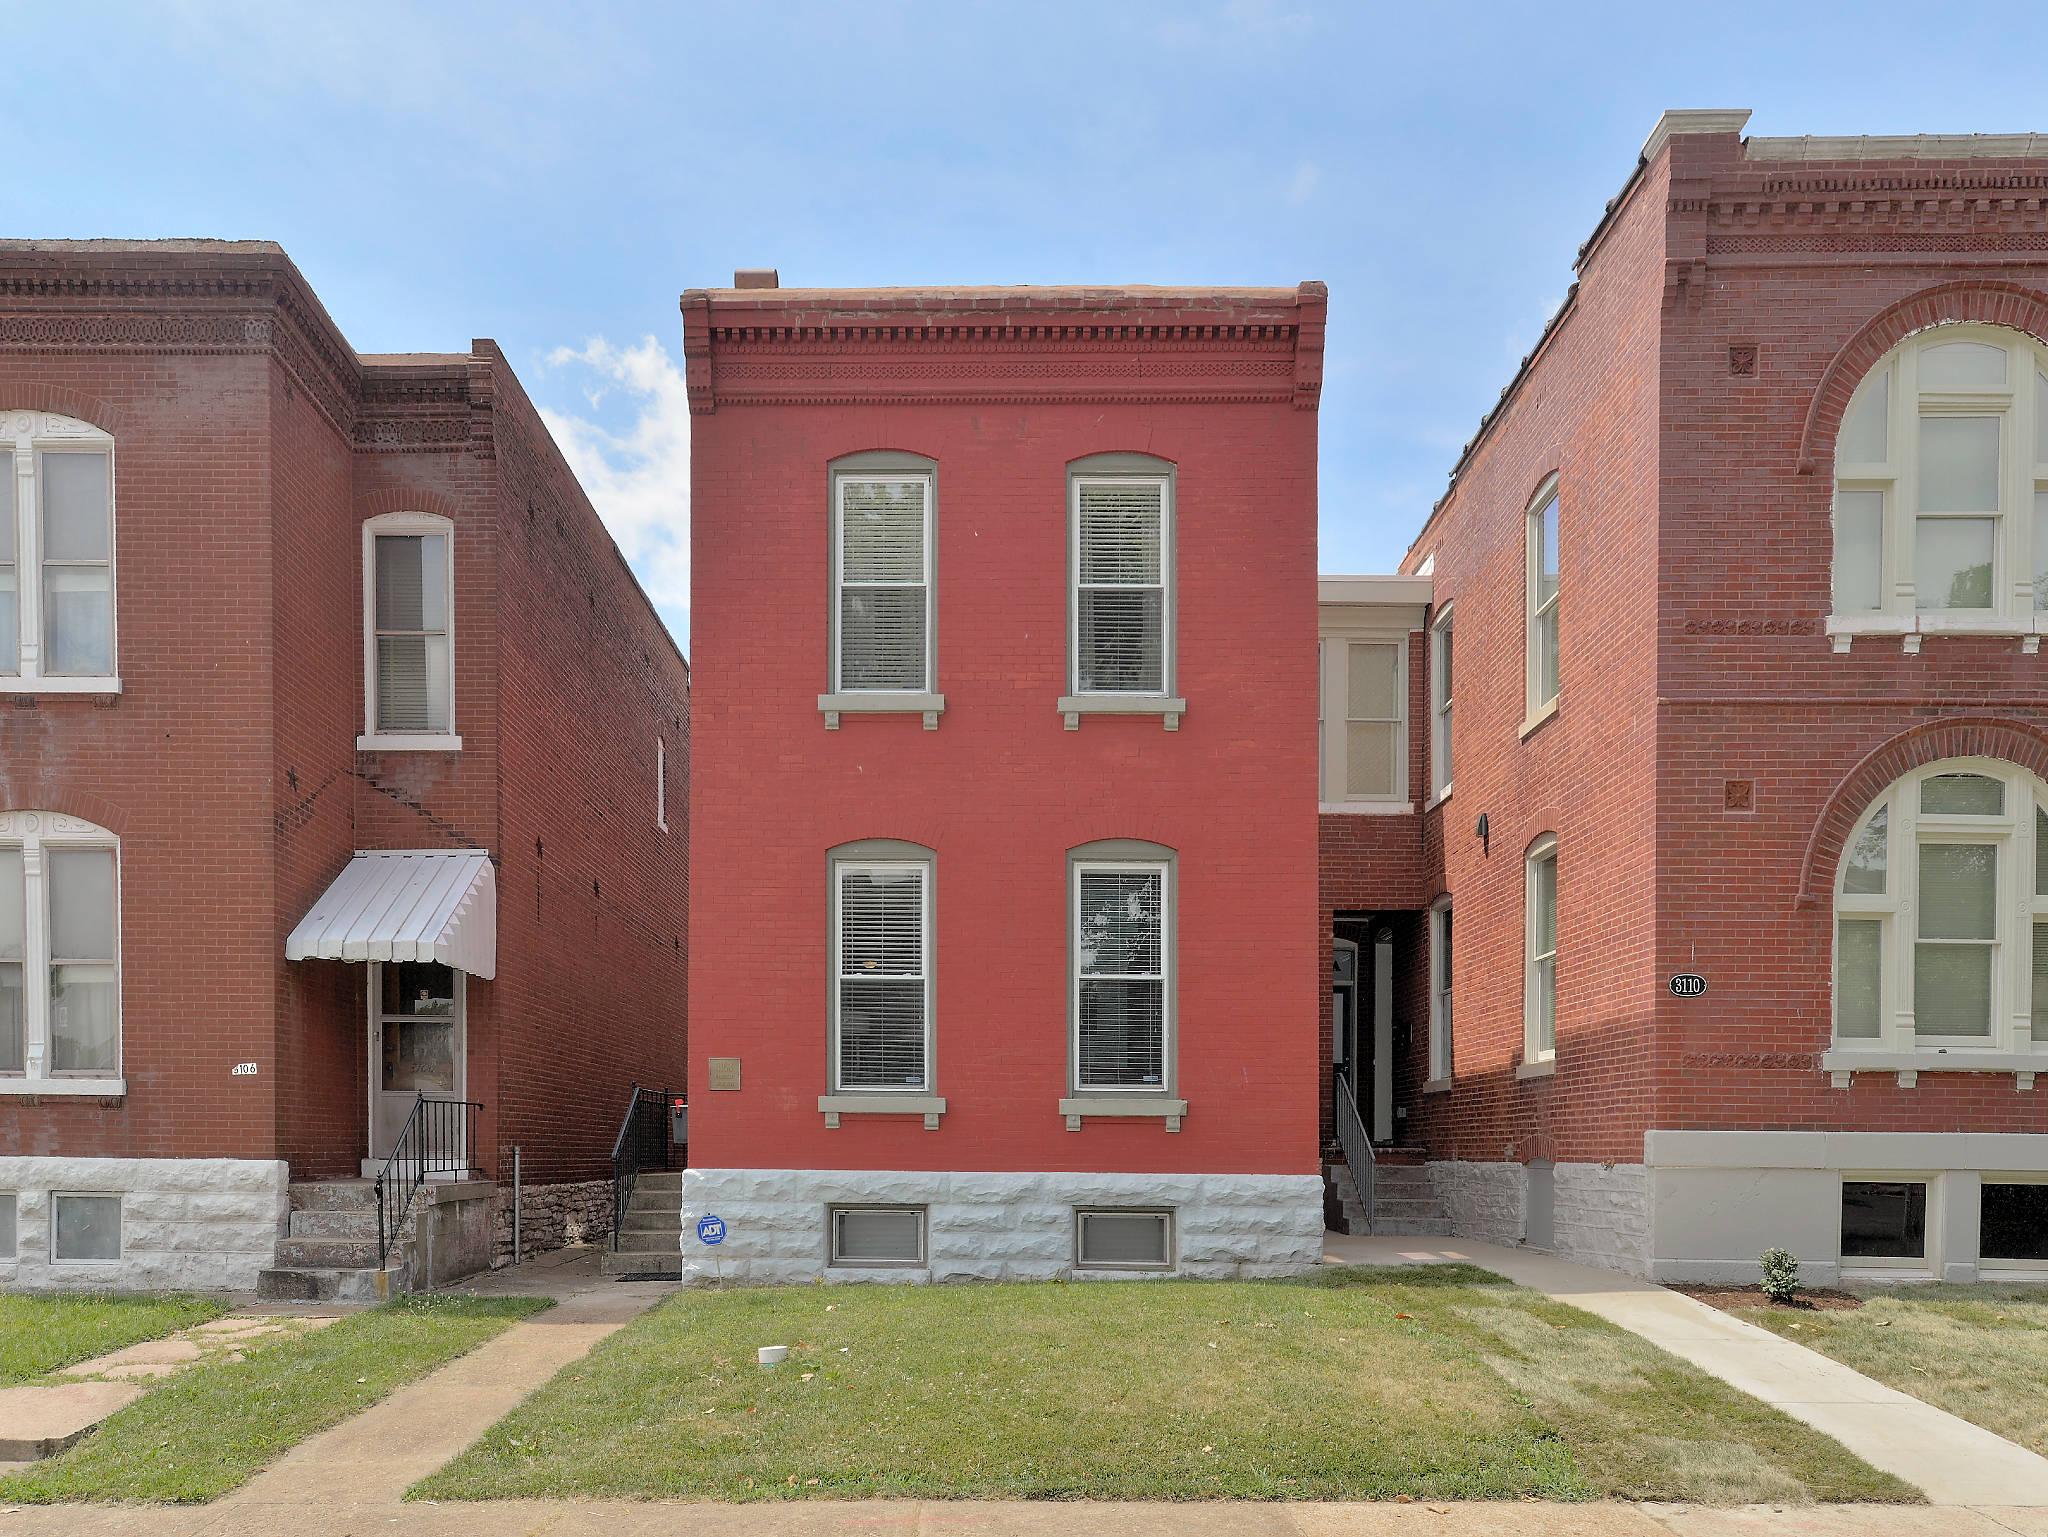 3108 Magnolia Ave, St Louis 63118-1272